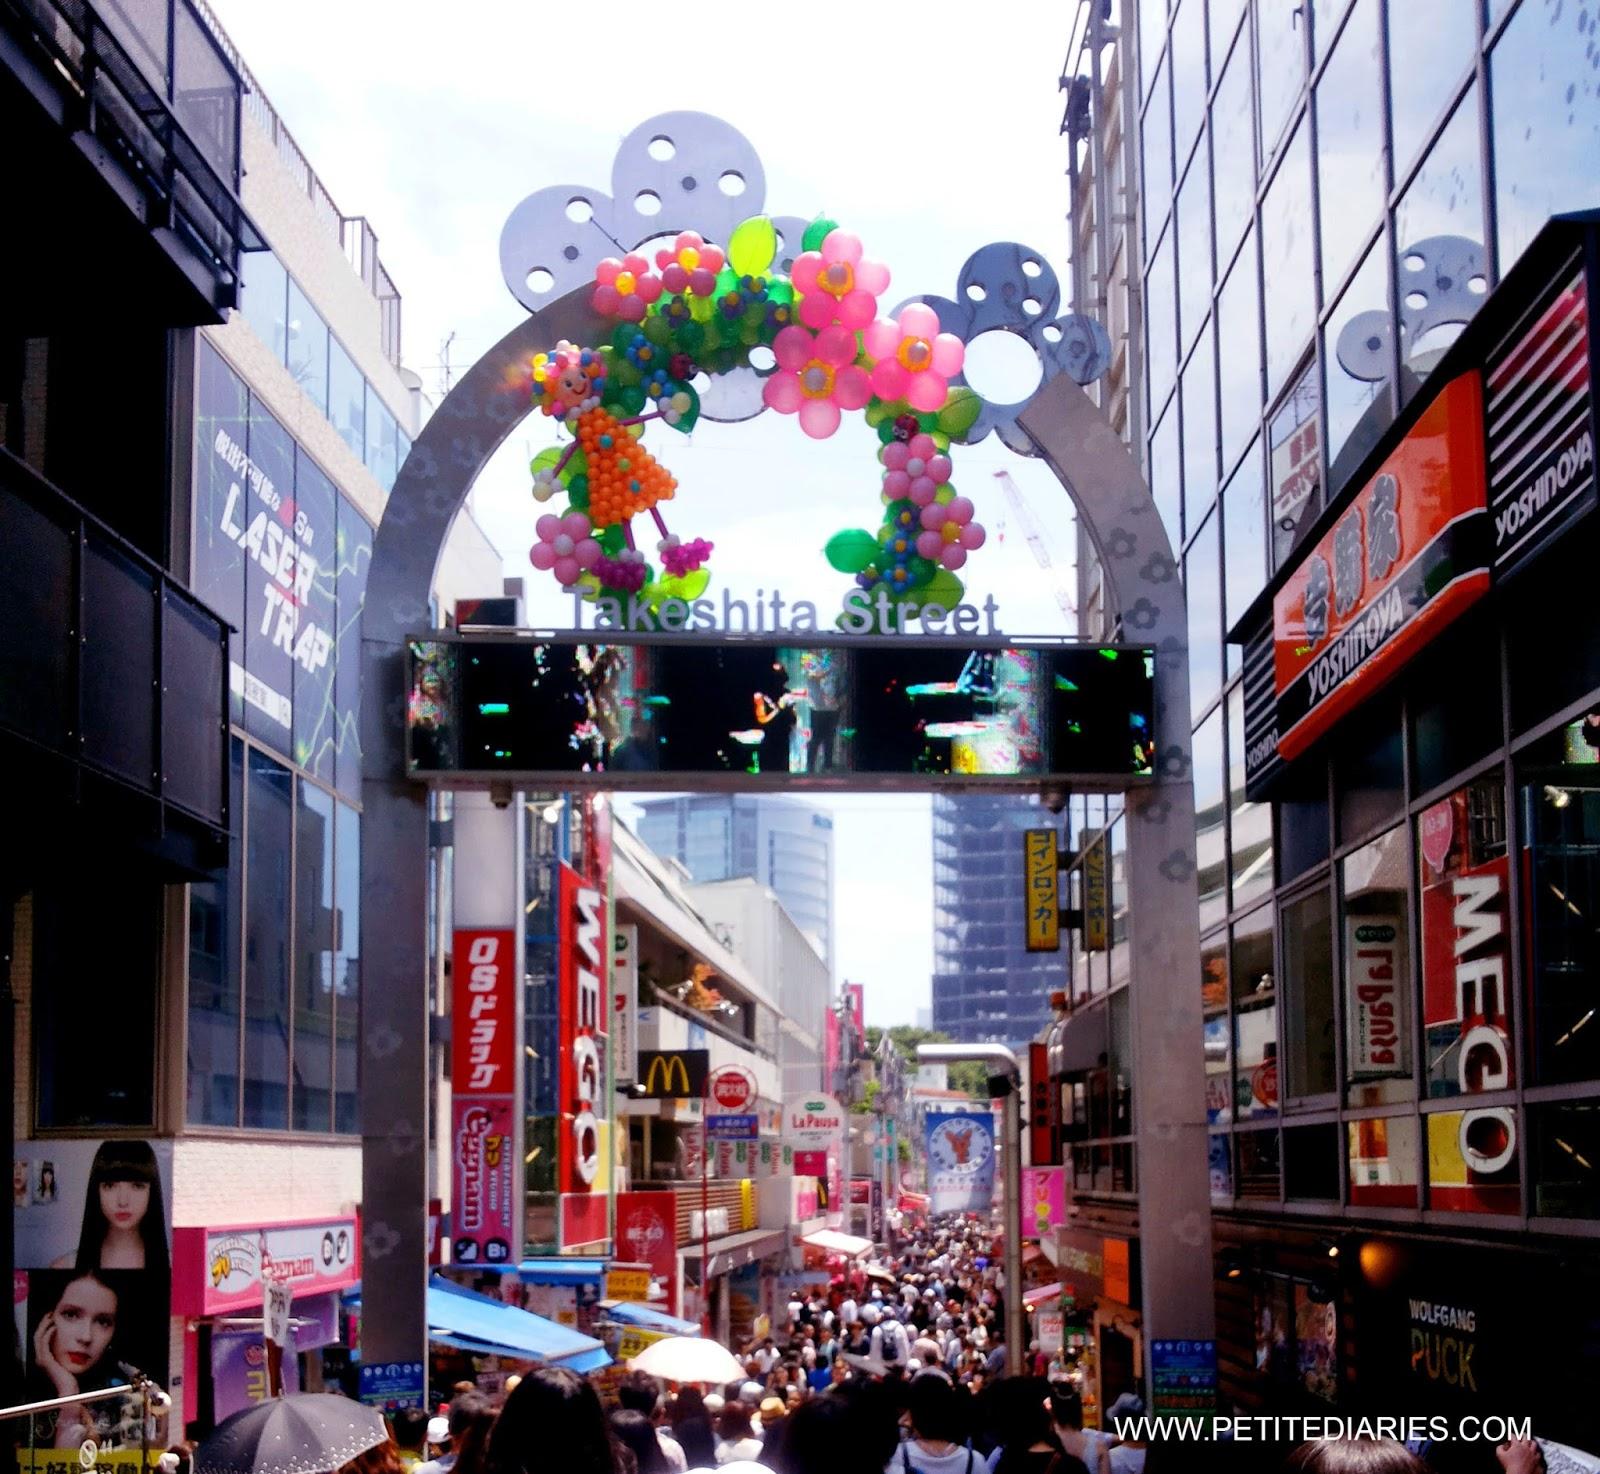 takeshita street harajuku shopping experience